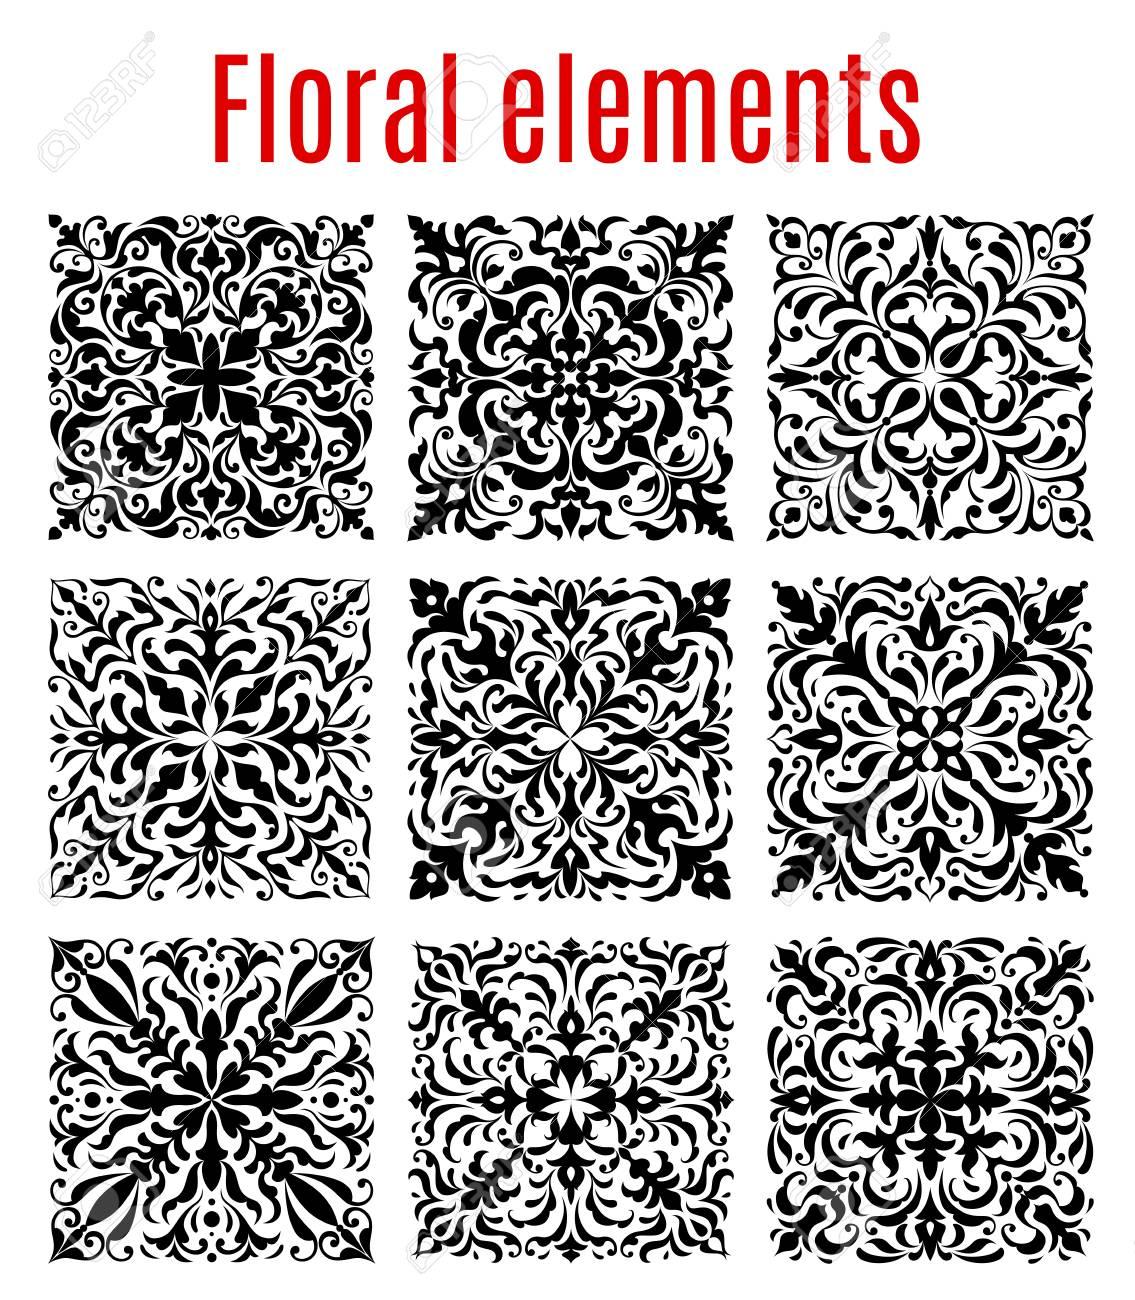 Floral tiles and flourish ornament borders of damask or flowery floral tiles and flourish ornament borders of damask or flowery vector elements vector baroque ornamental jeuxipadfo Gallery